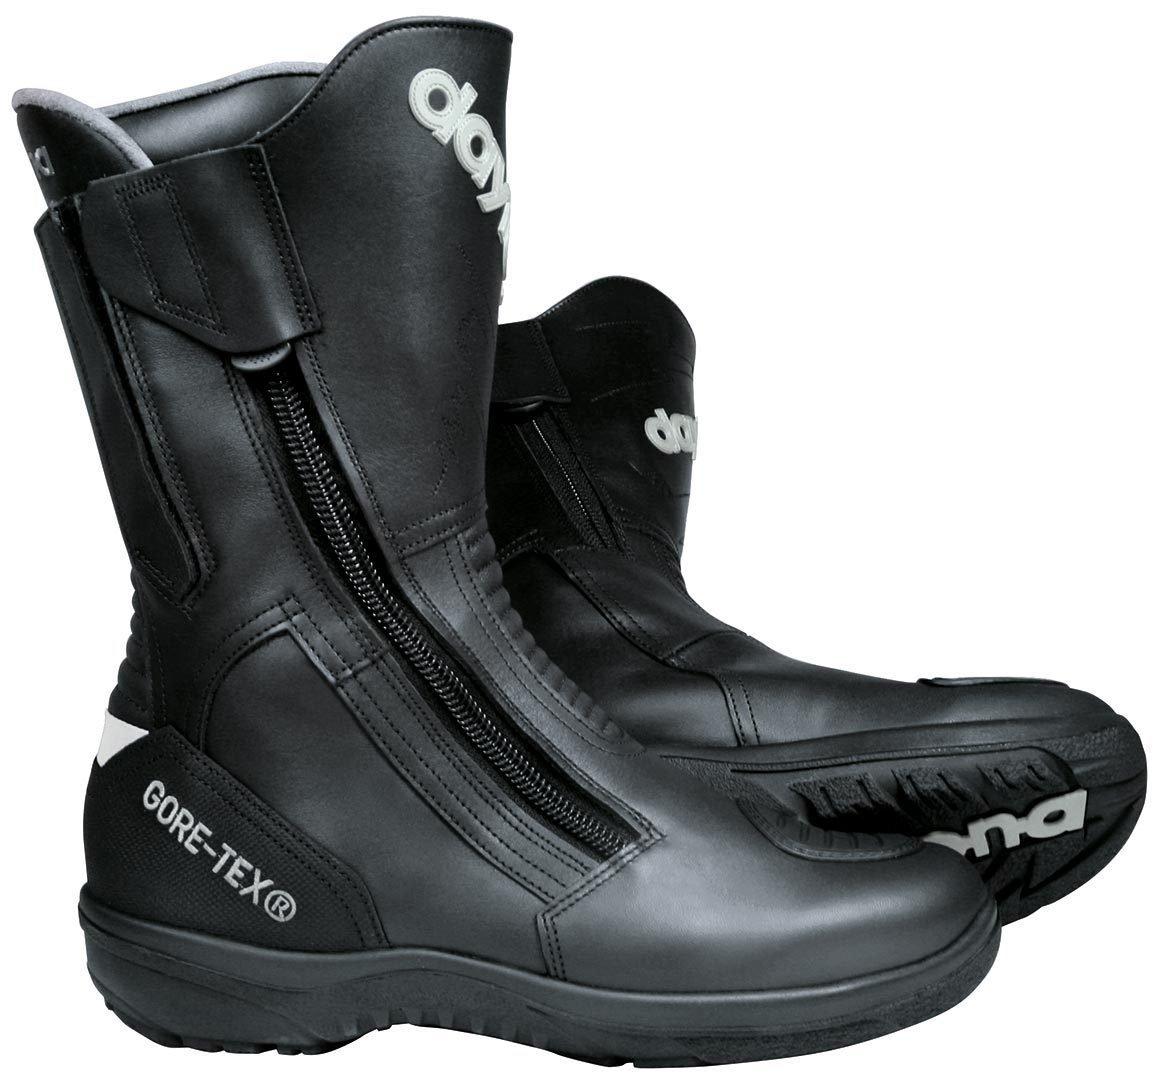 Road Star GORE-TEX boot black 43